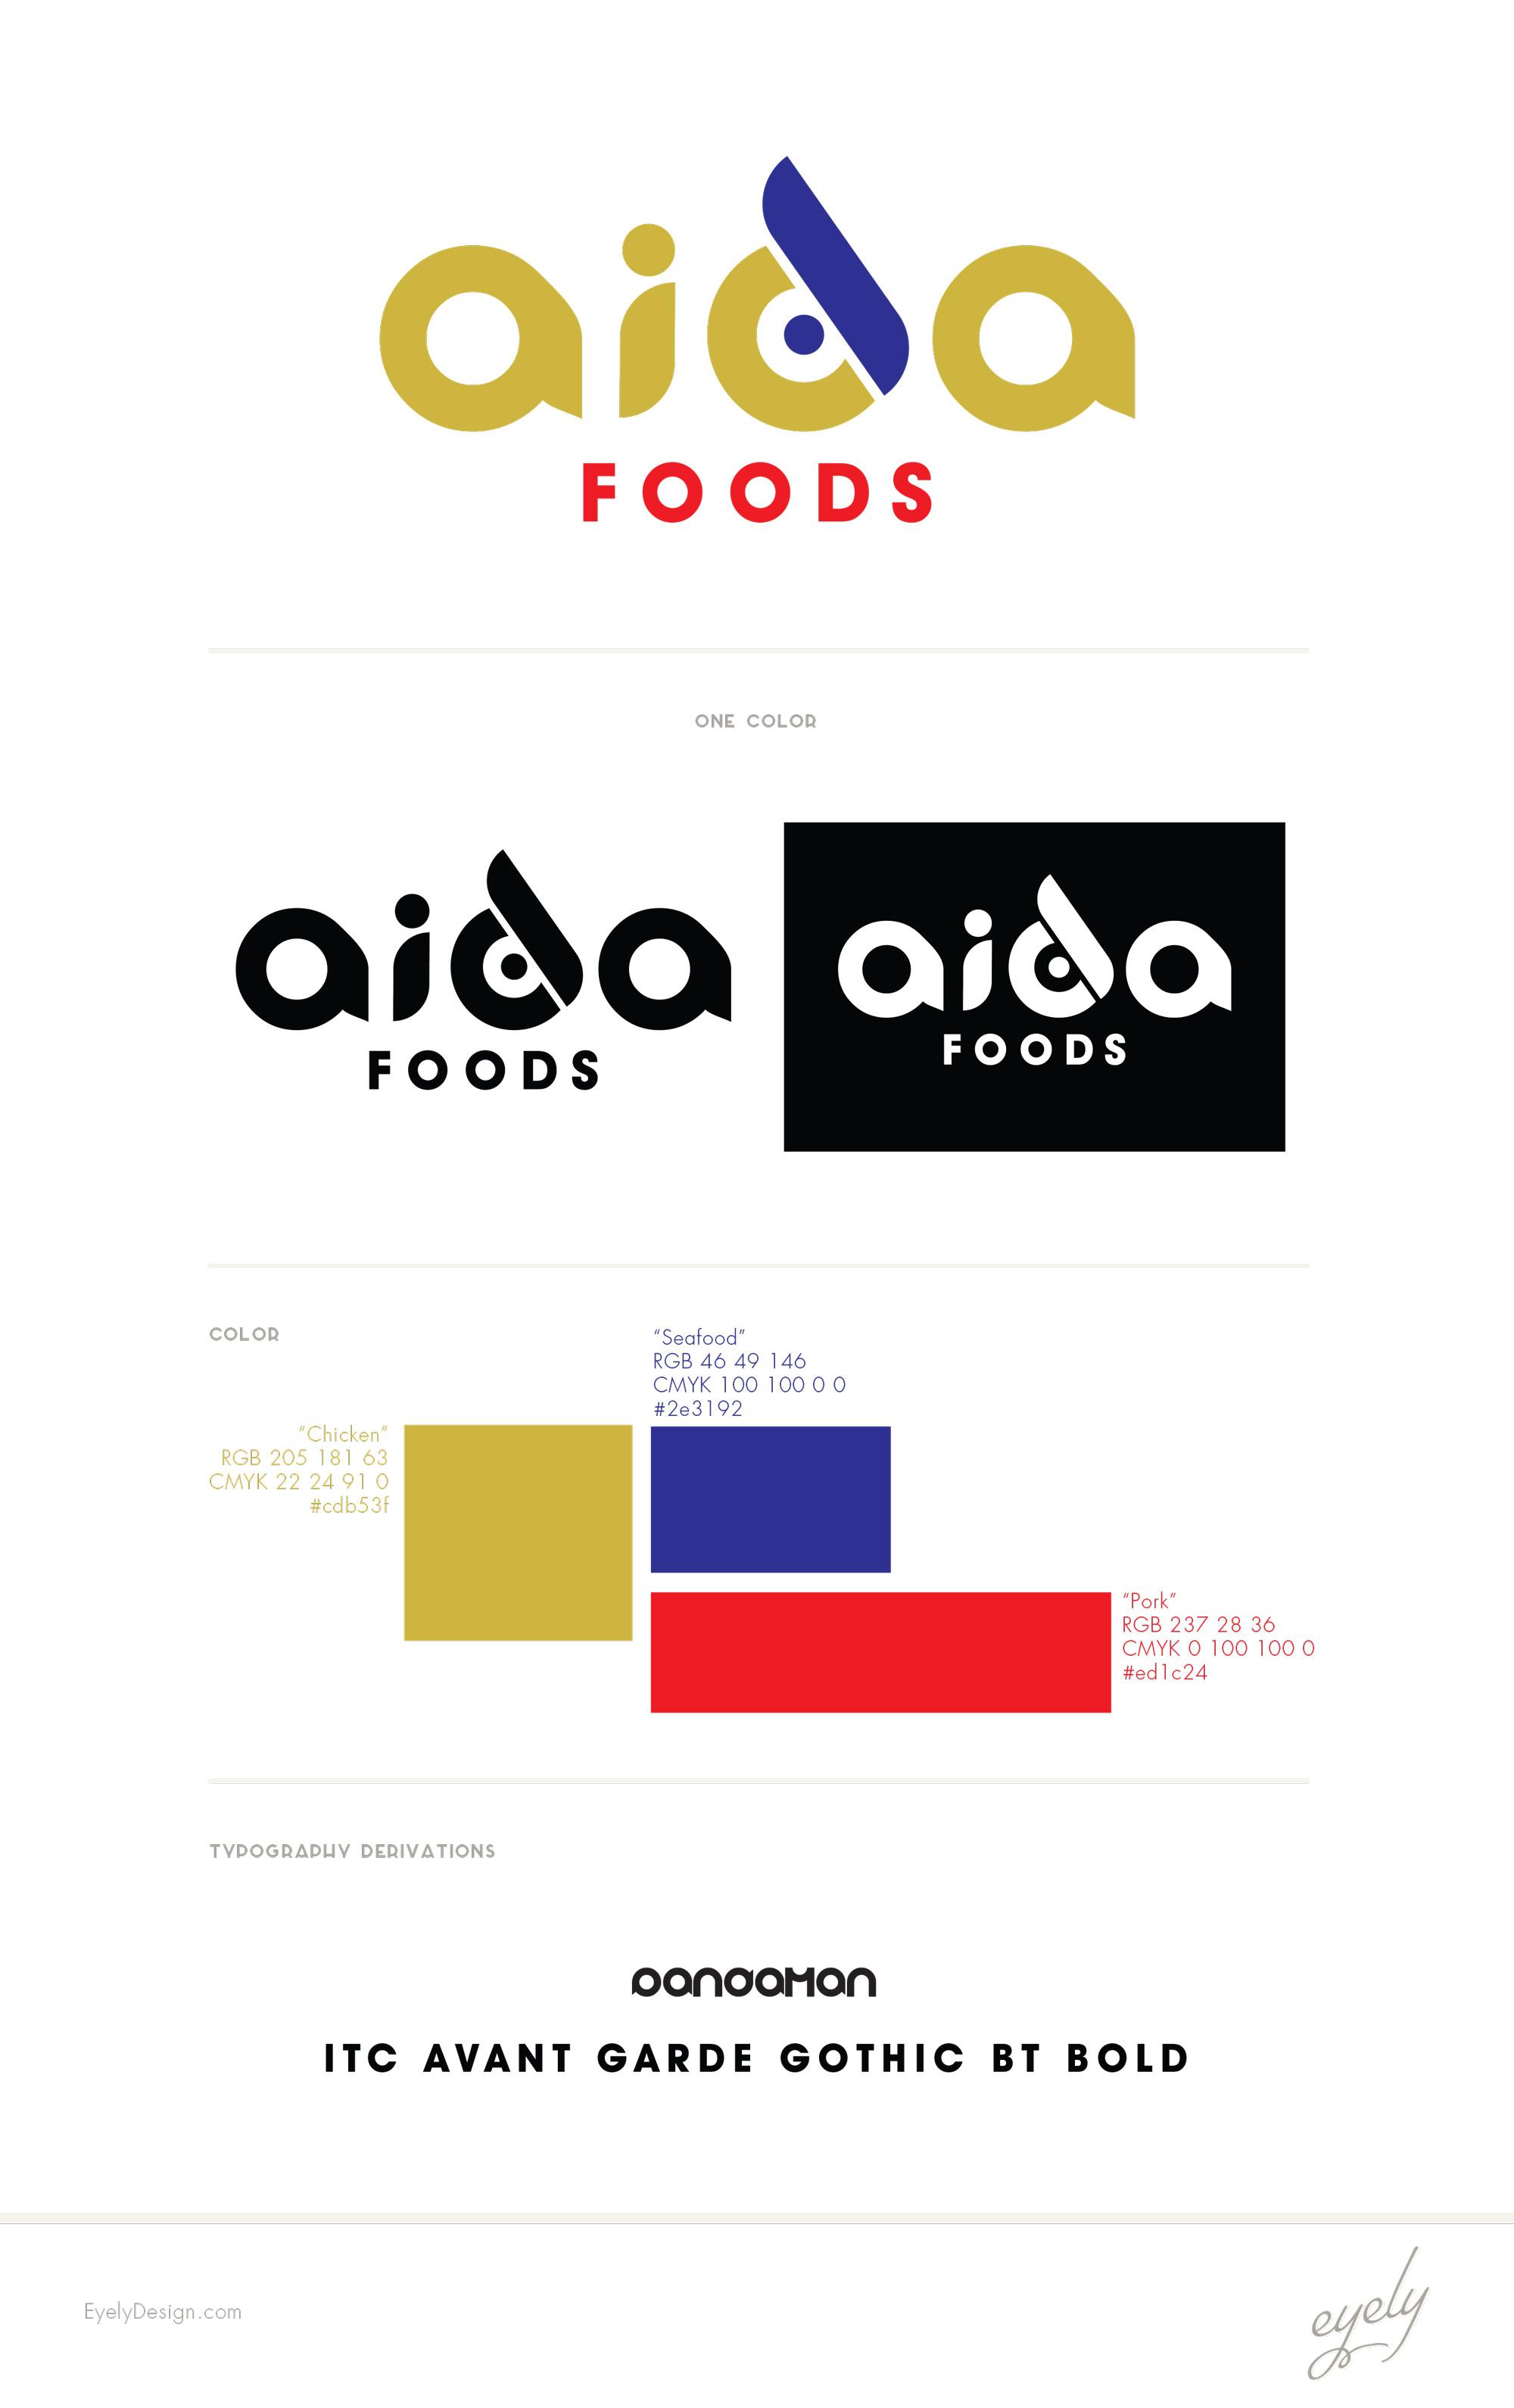 aida foods logo